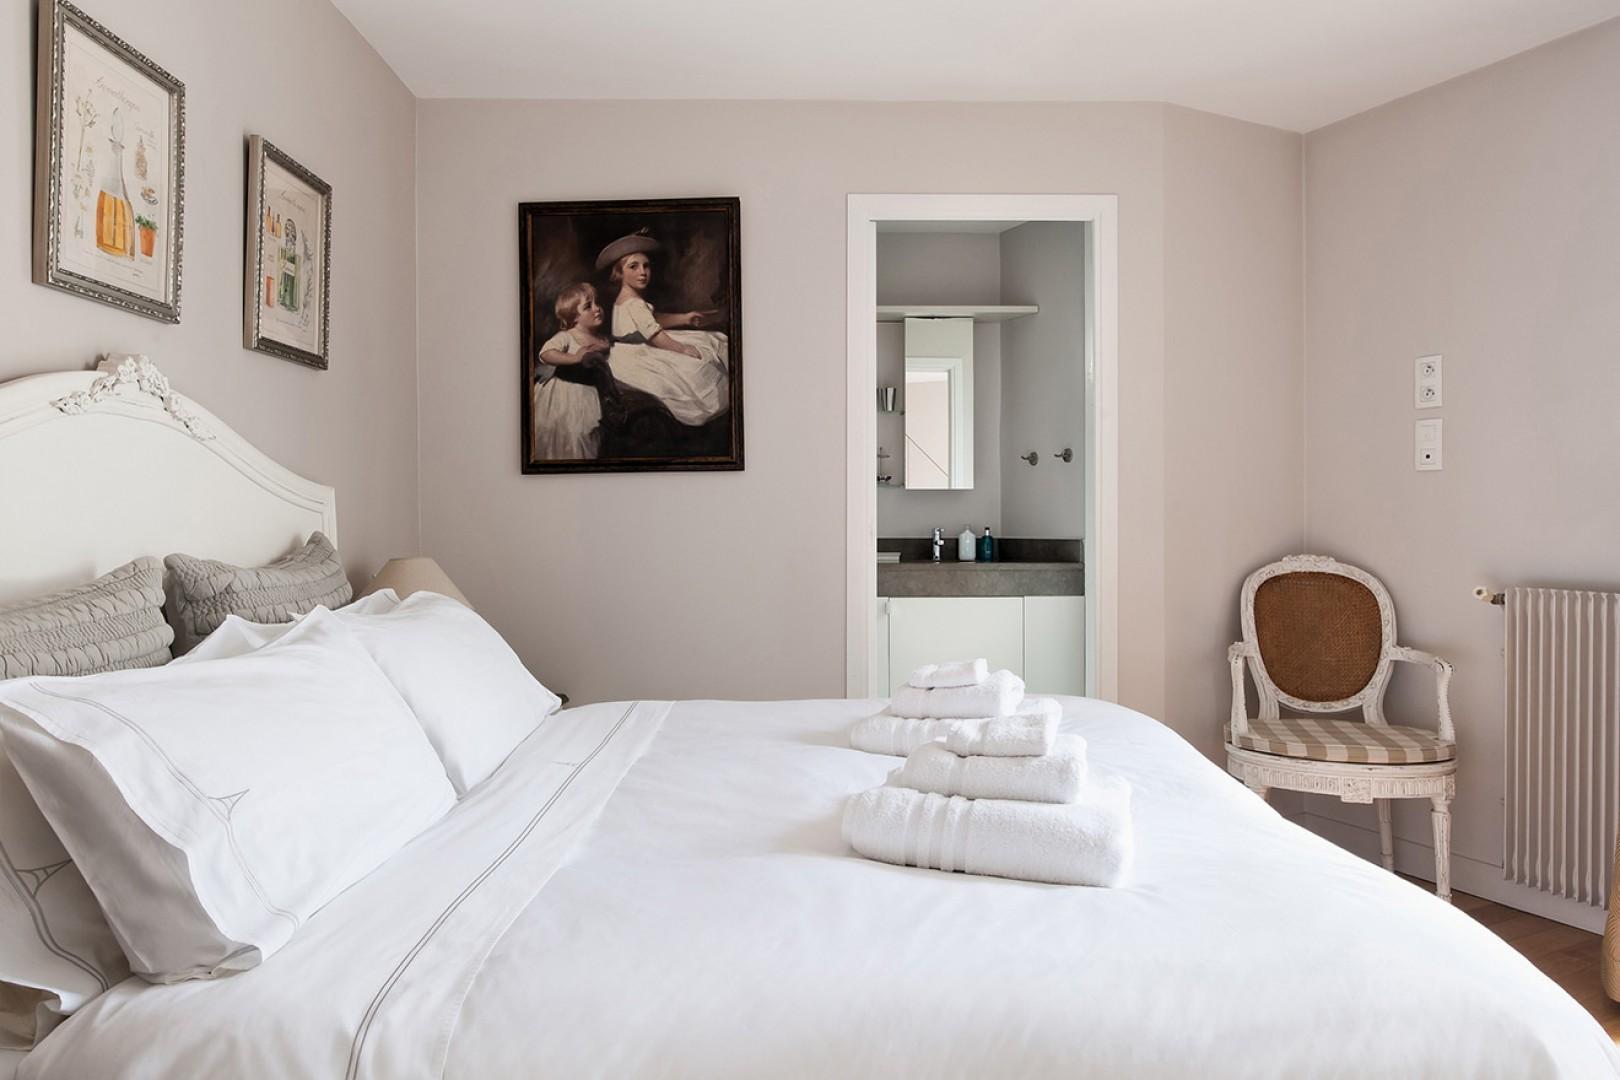 Relax in the stunning bedroom 1 with an en suite bathroom.